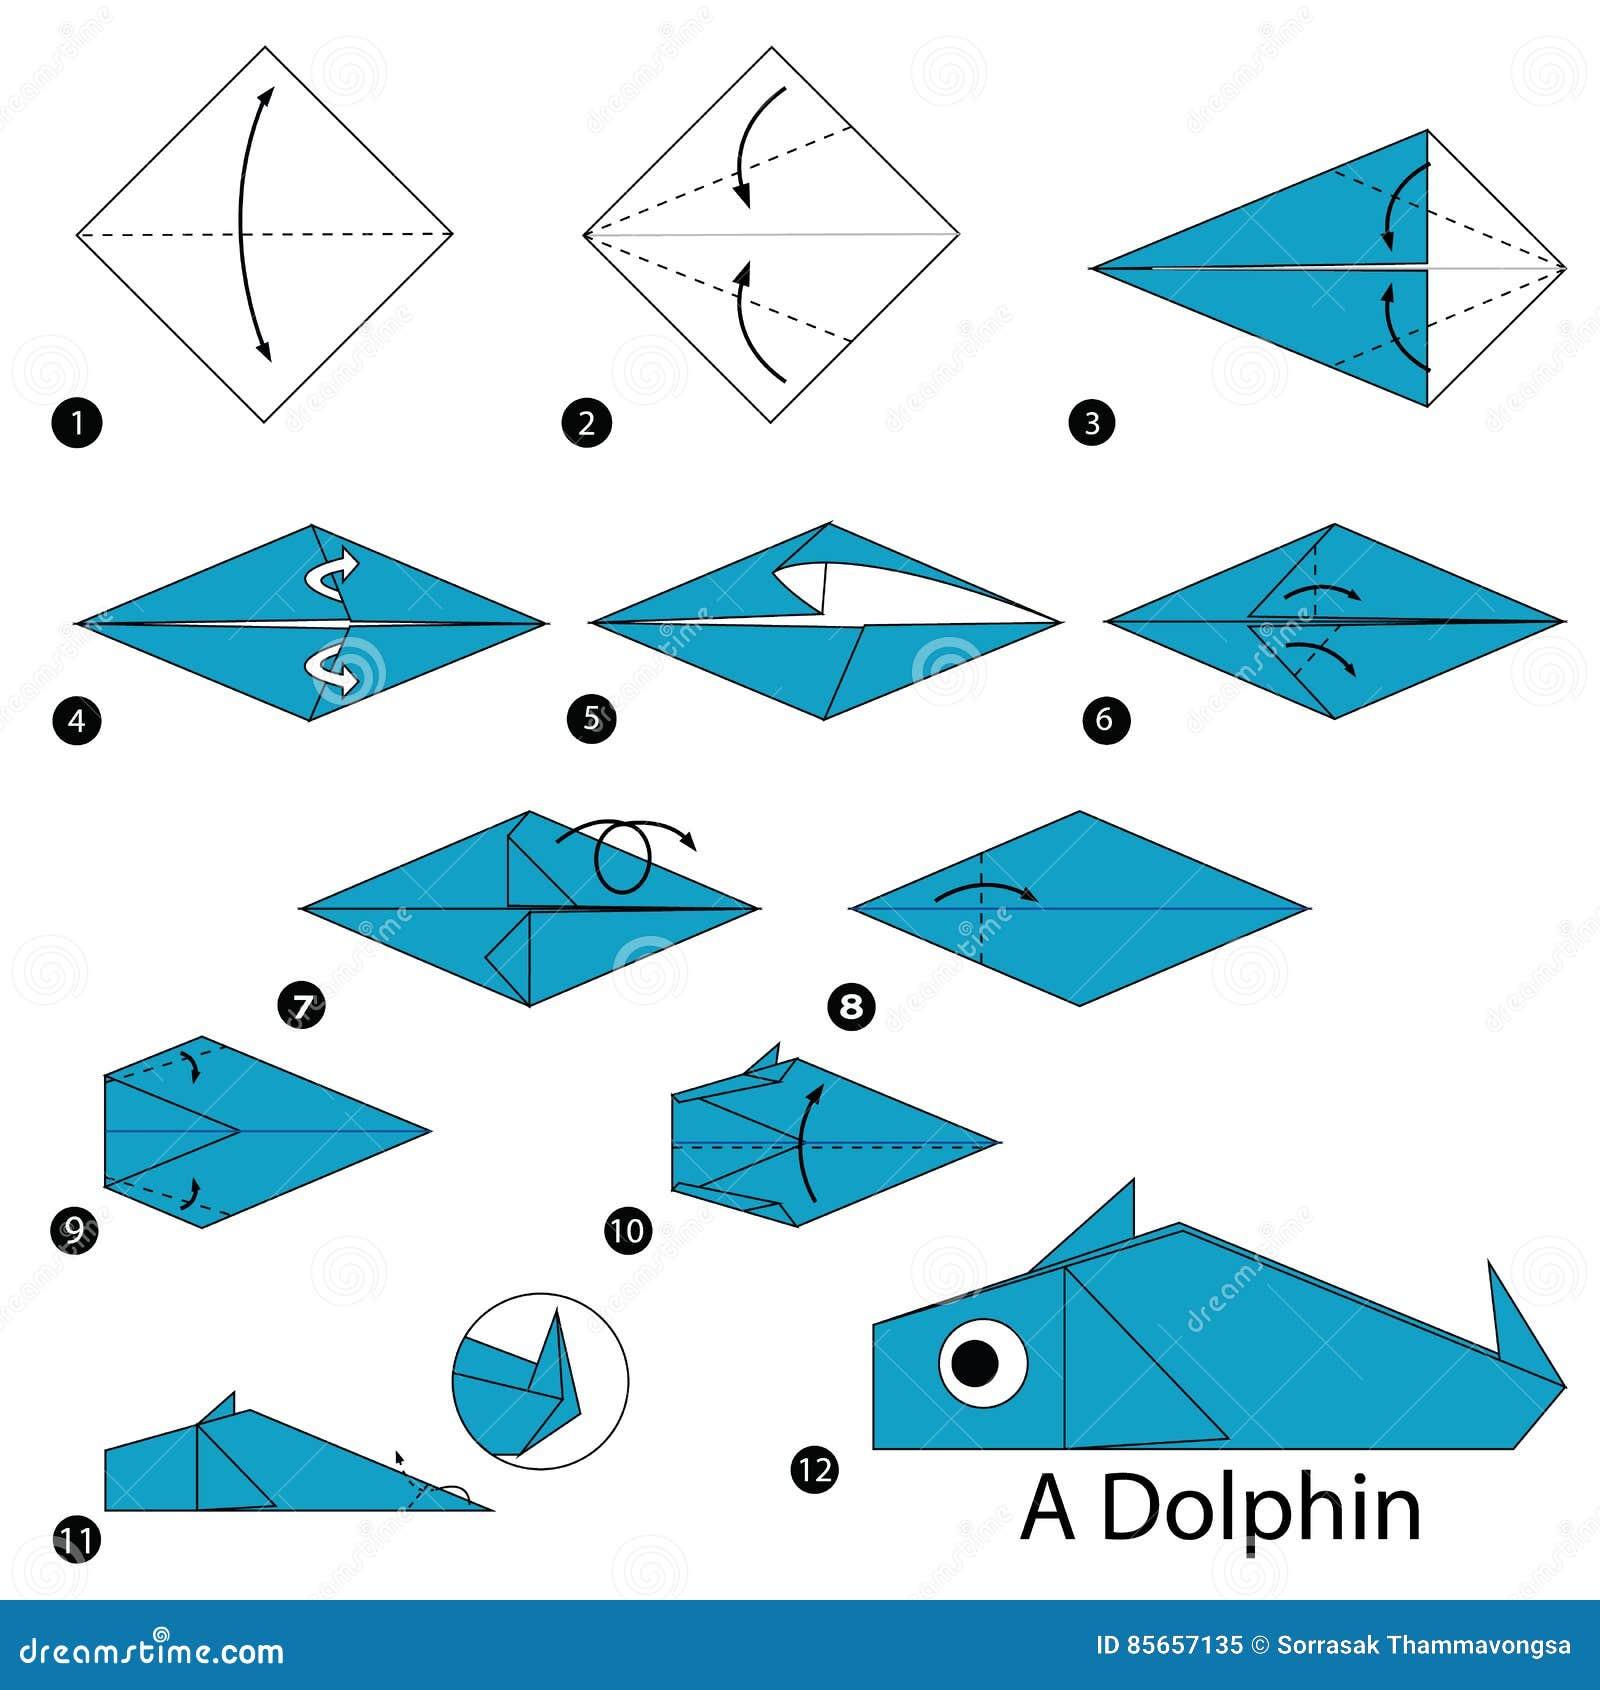 balloon animal instructions pdf